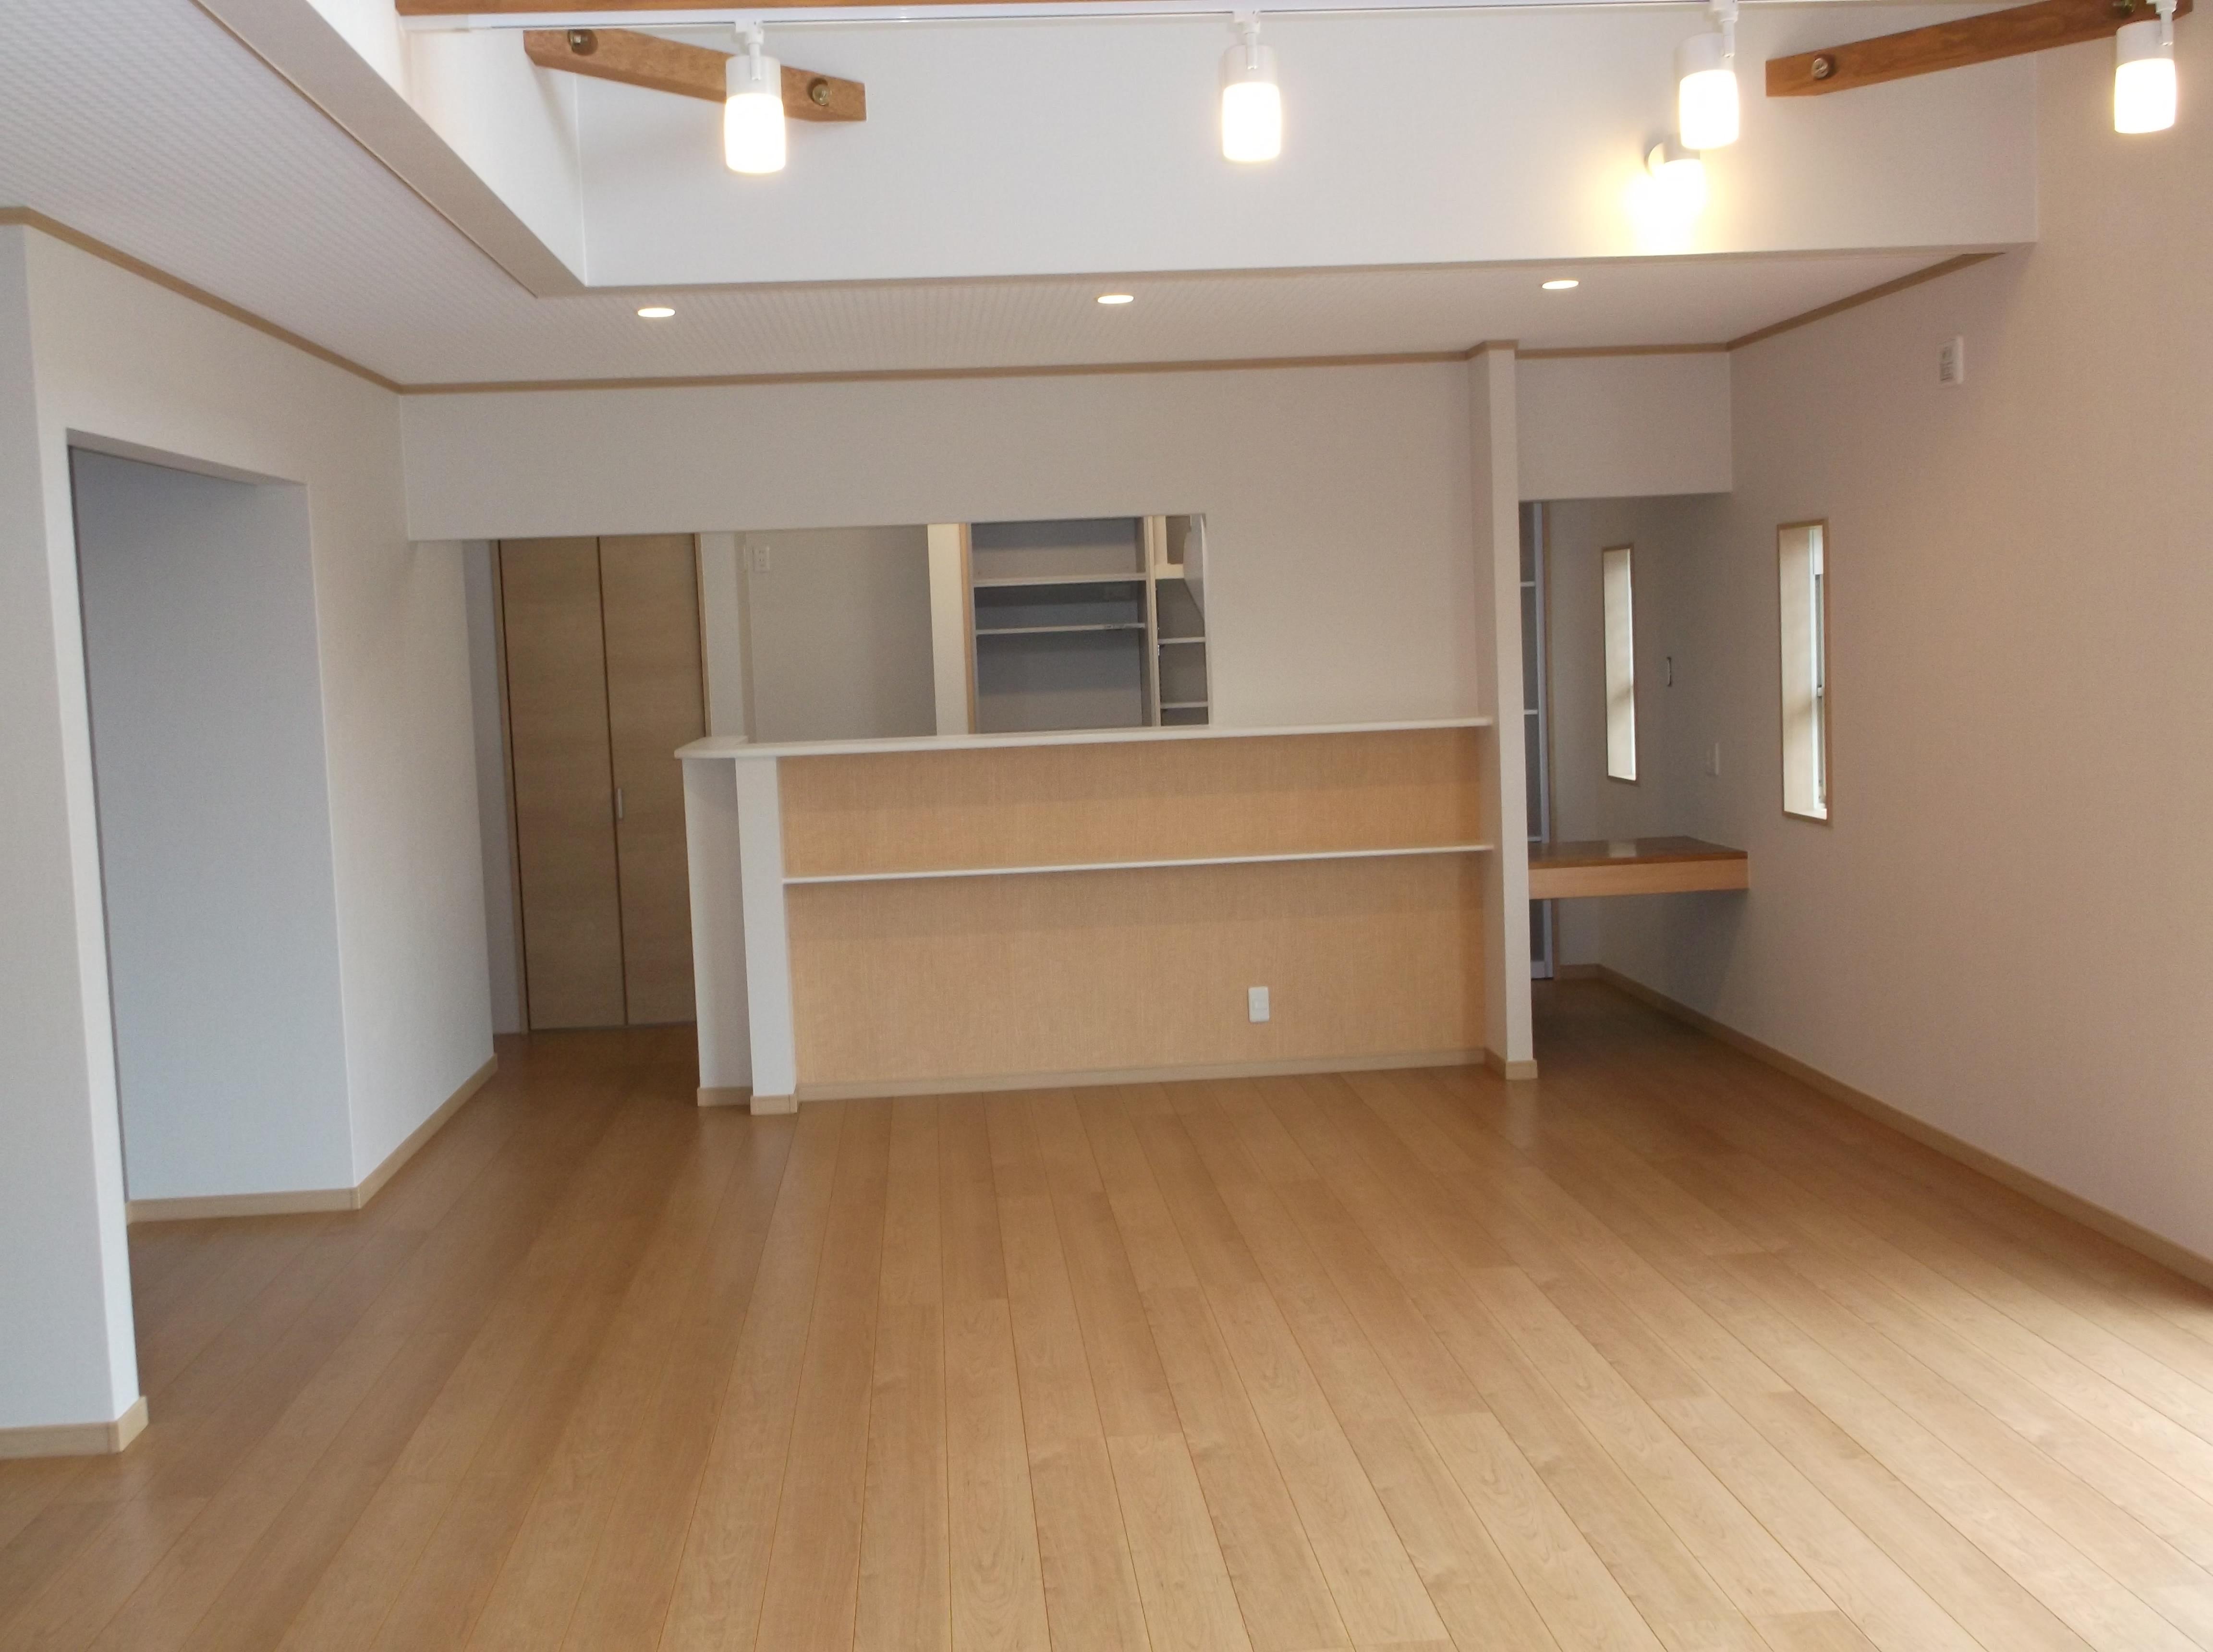 神戸市 個人住宅新築工事イメージ05